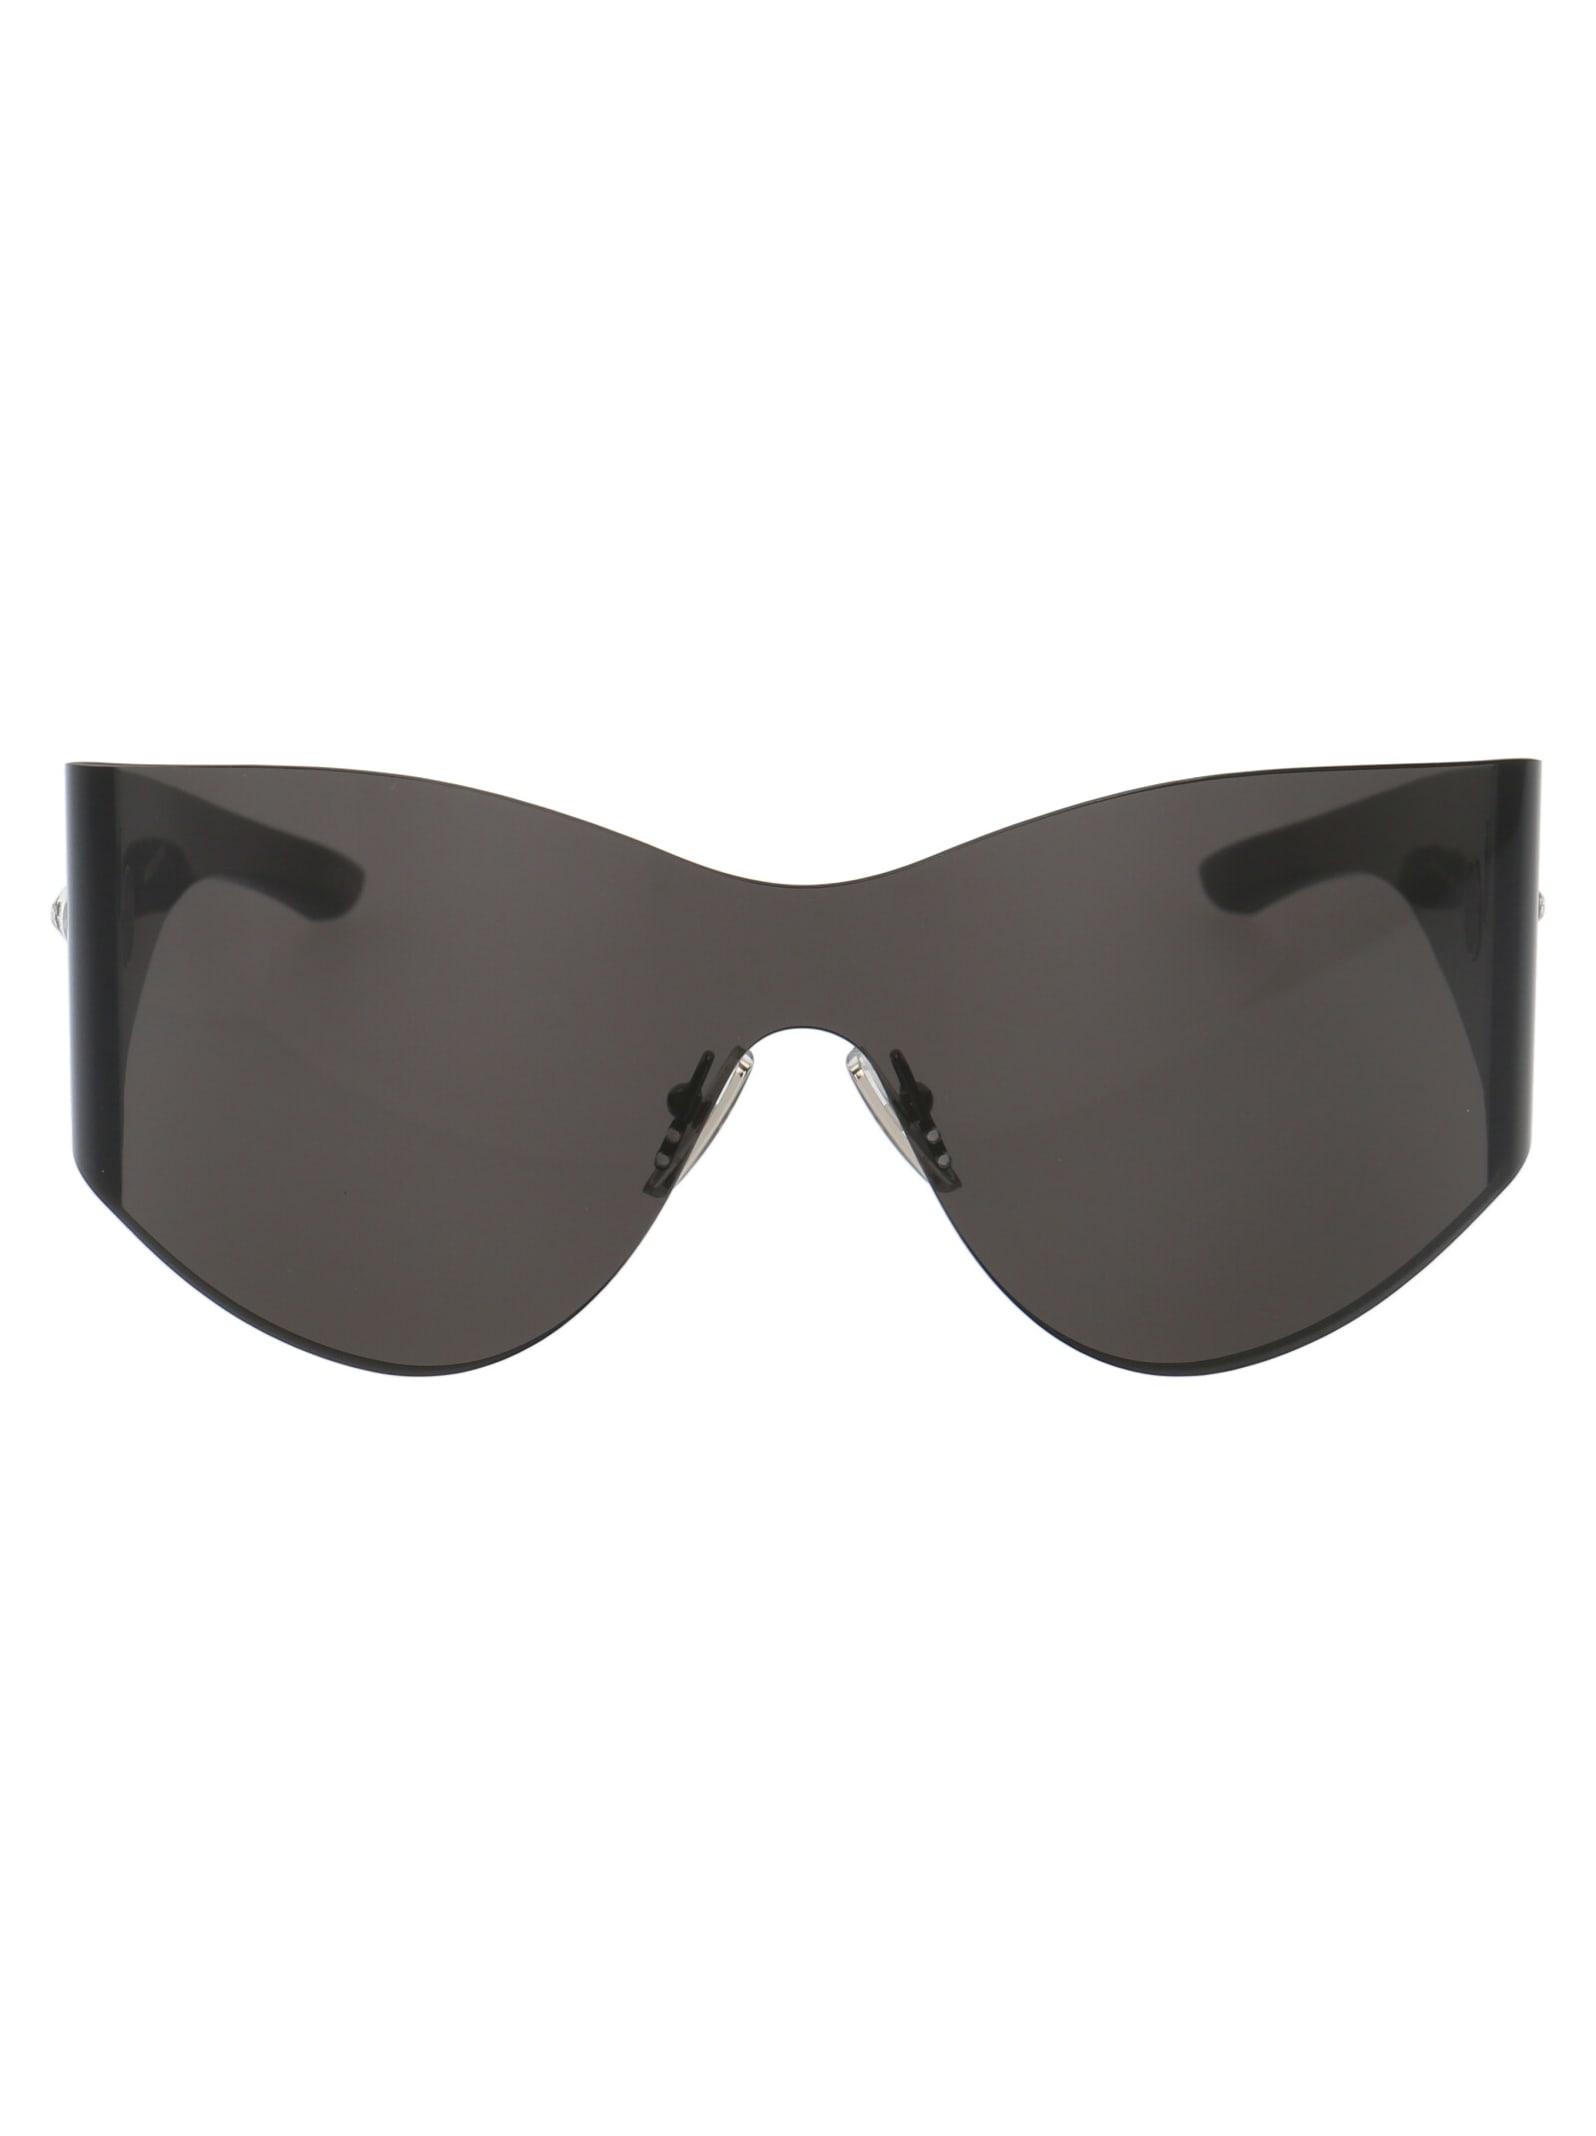 Balenciaga Sunglasses BB0122S SUNGLASSES